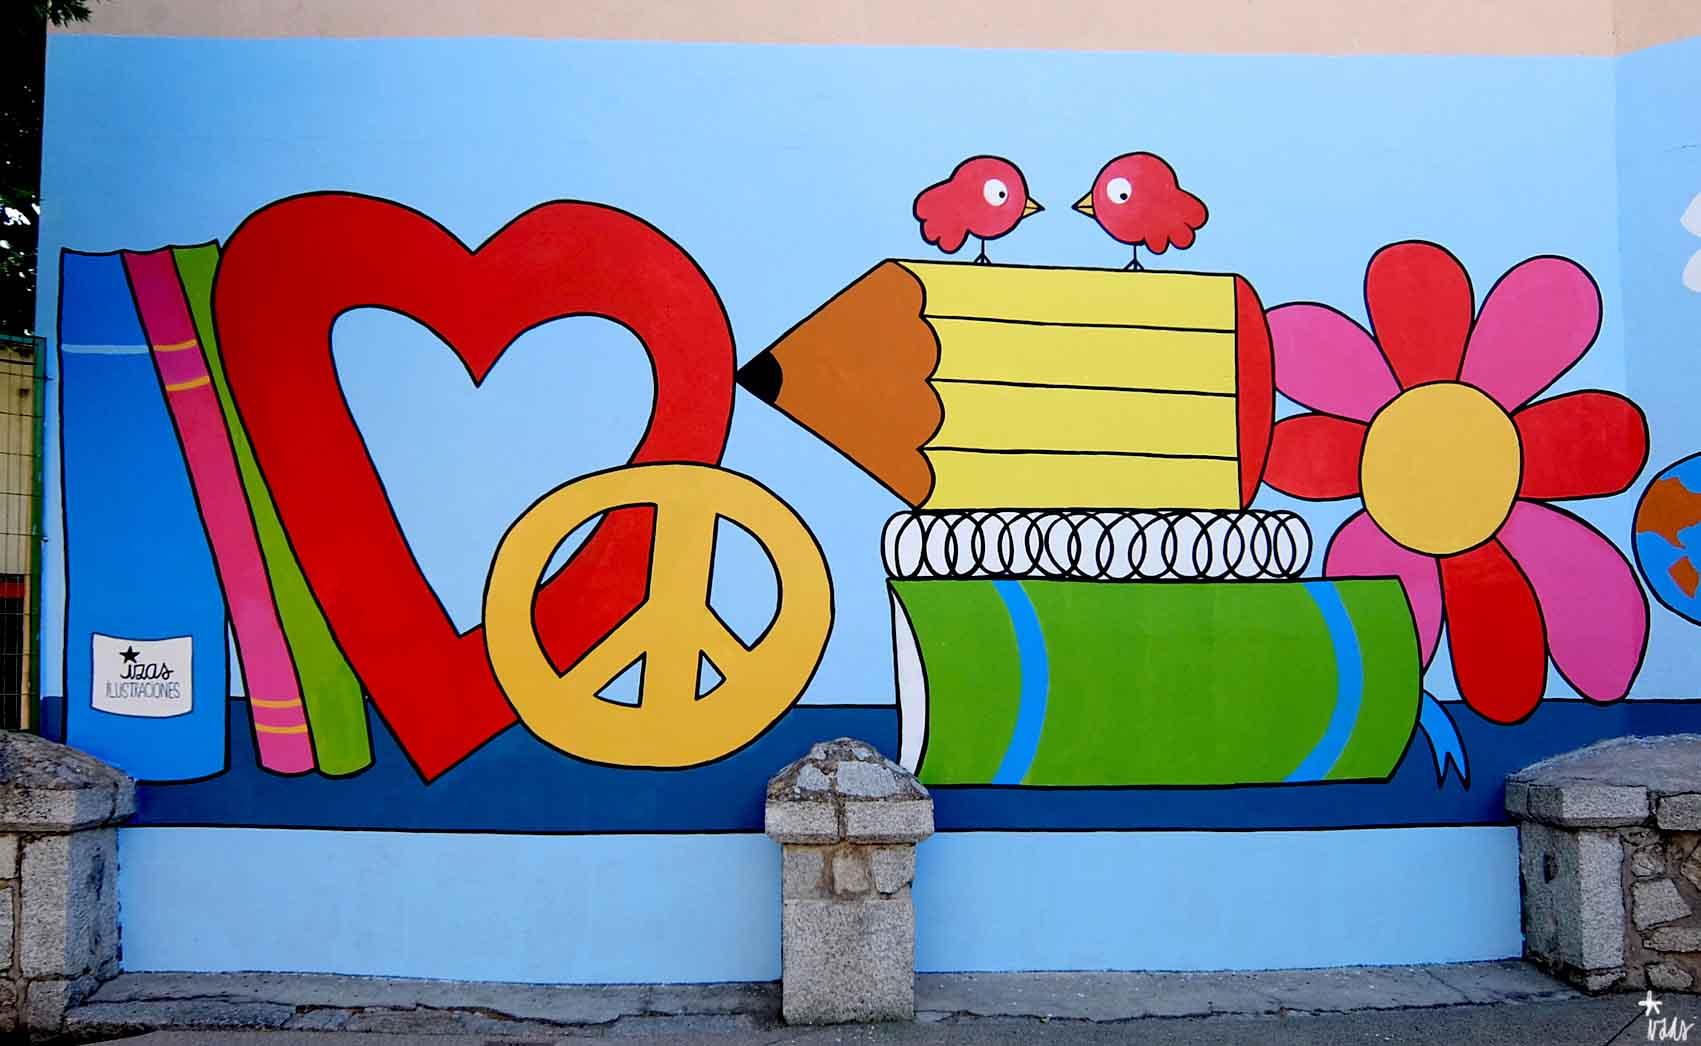 mural izas soledad sainz exterior 3